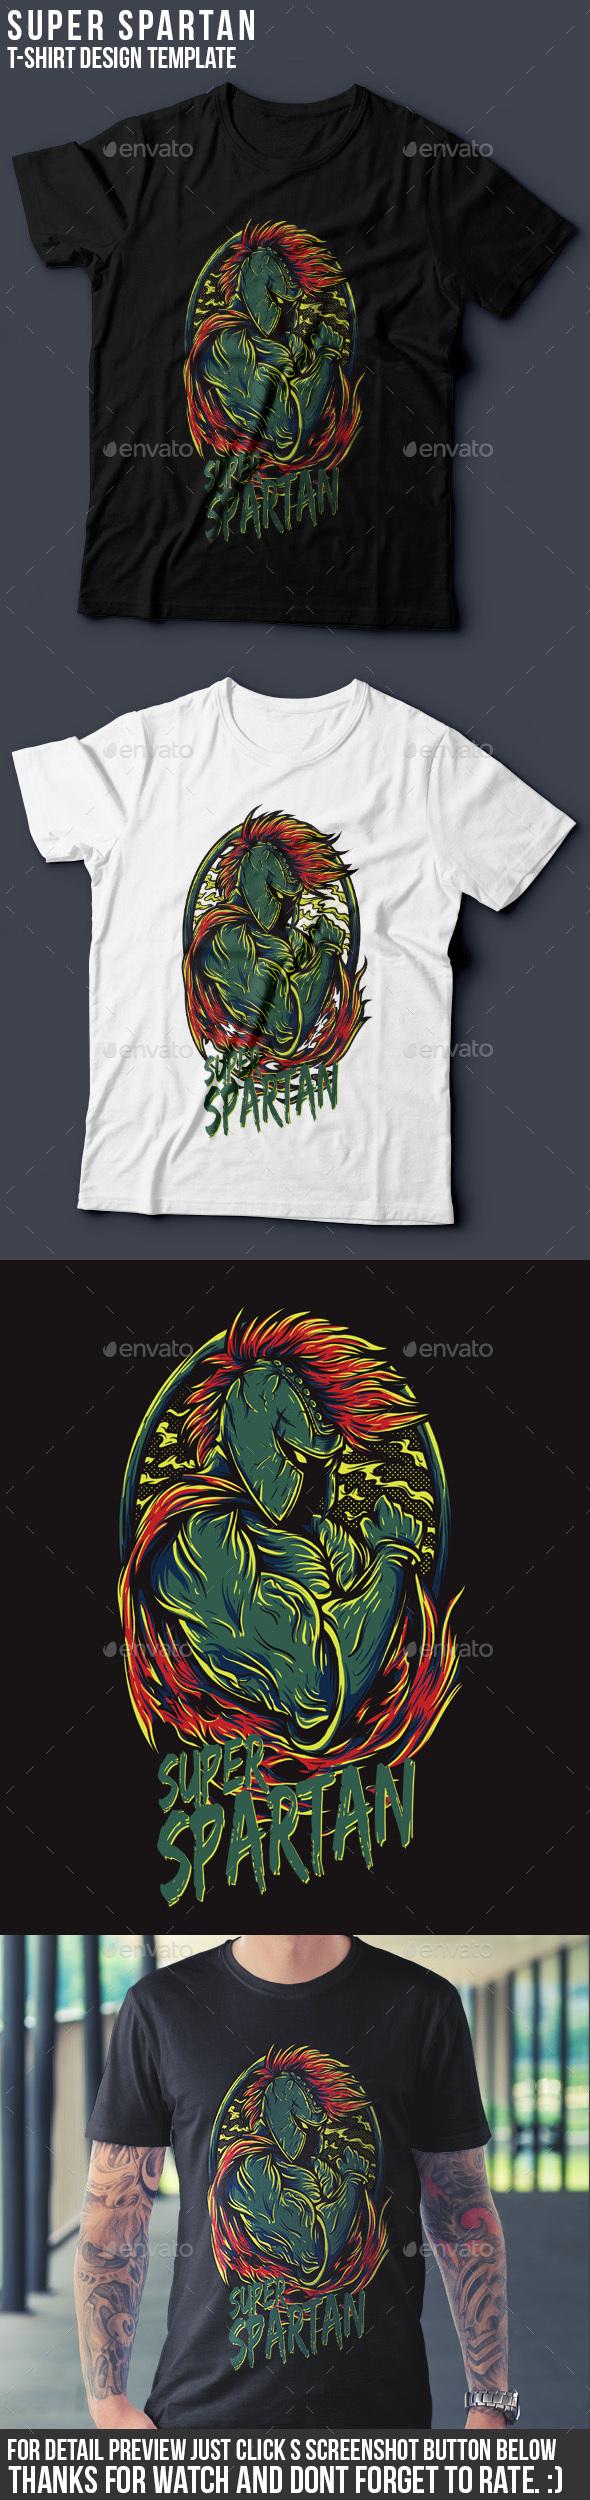 Super Spartan T-Shirt Design - Sports & Teams T-Shirts